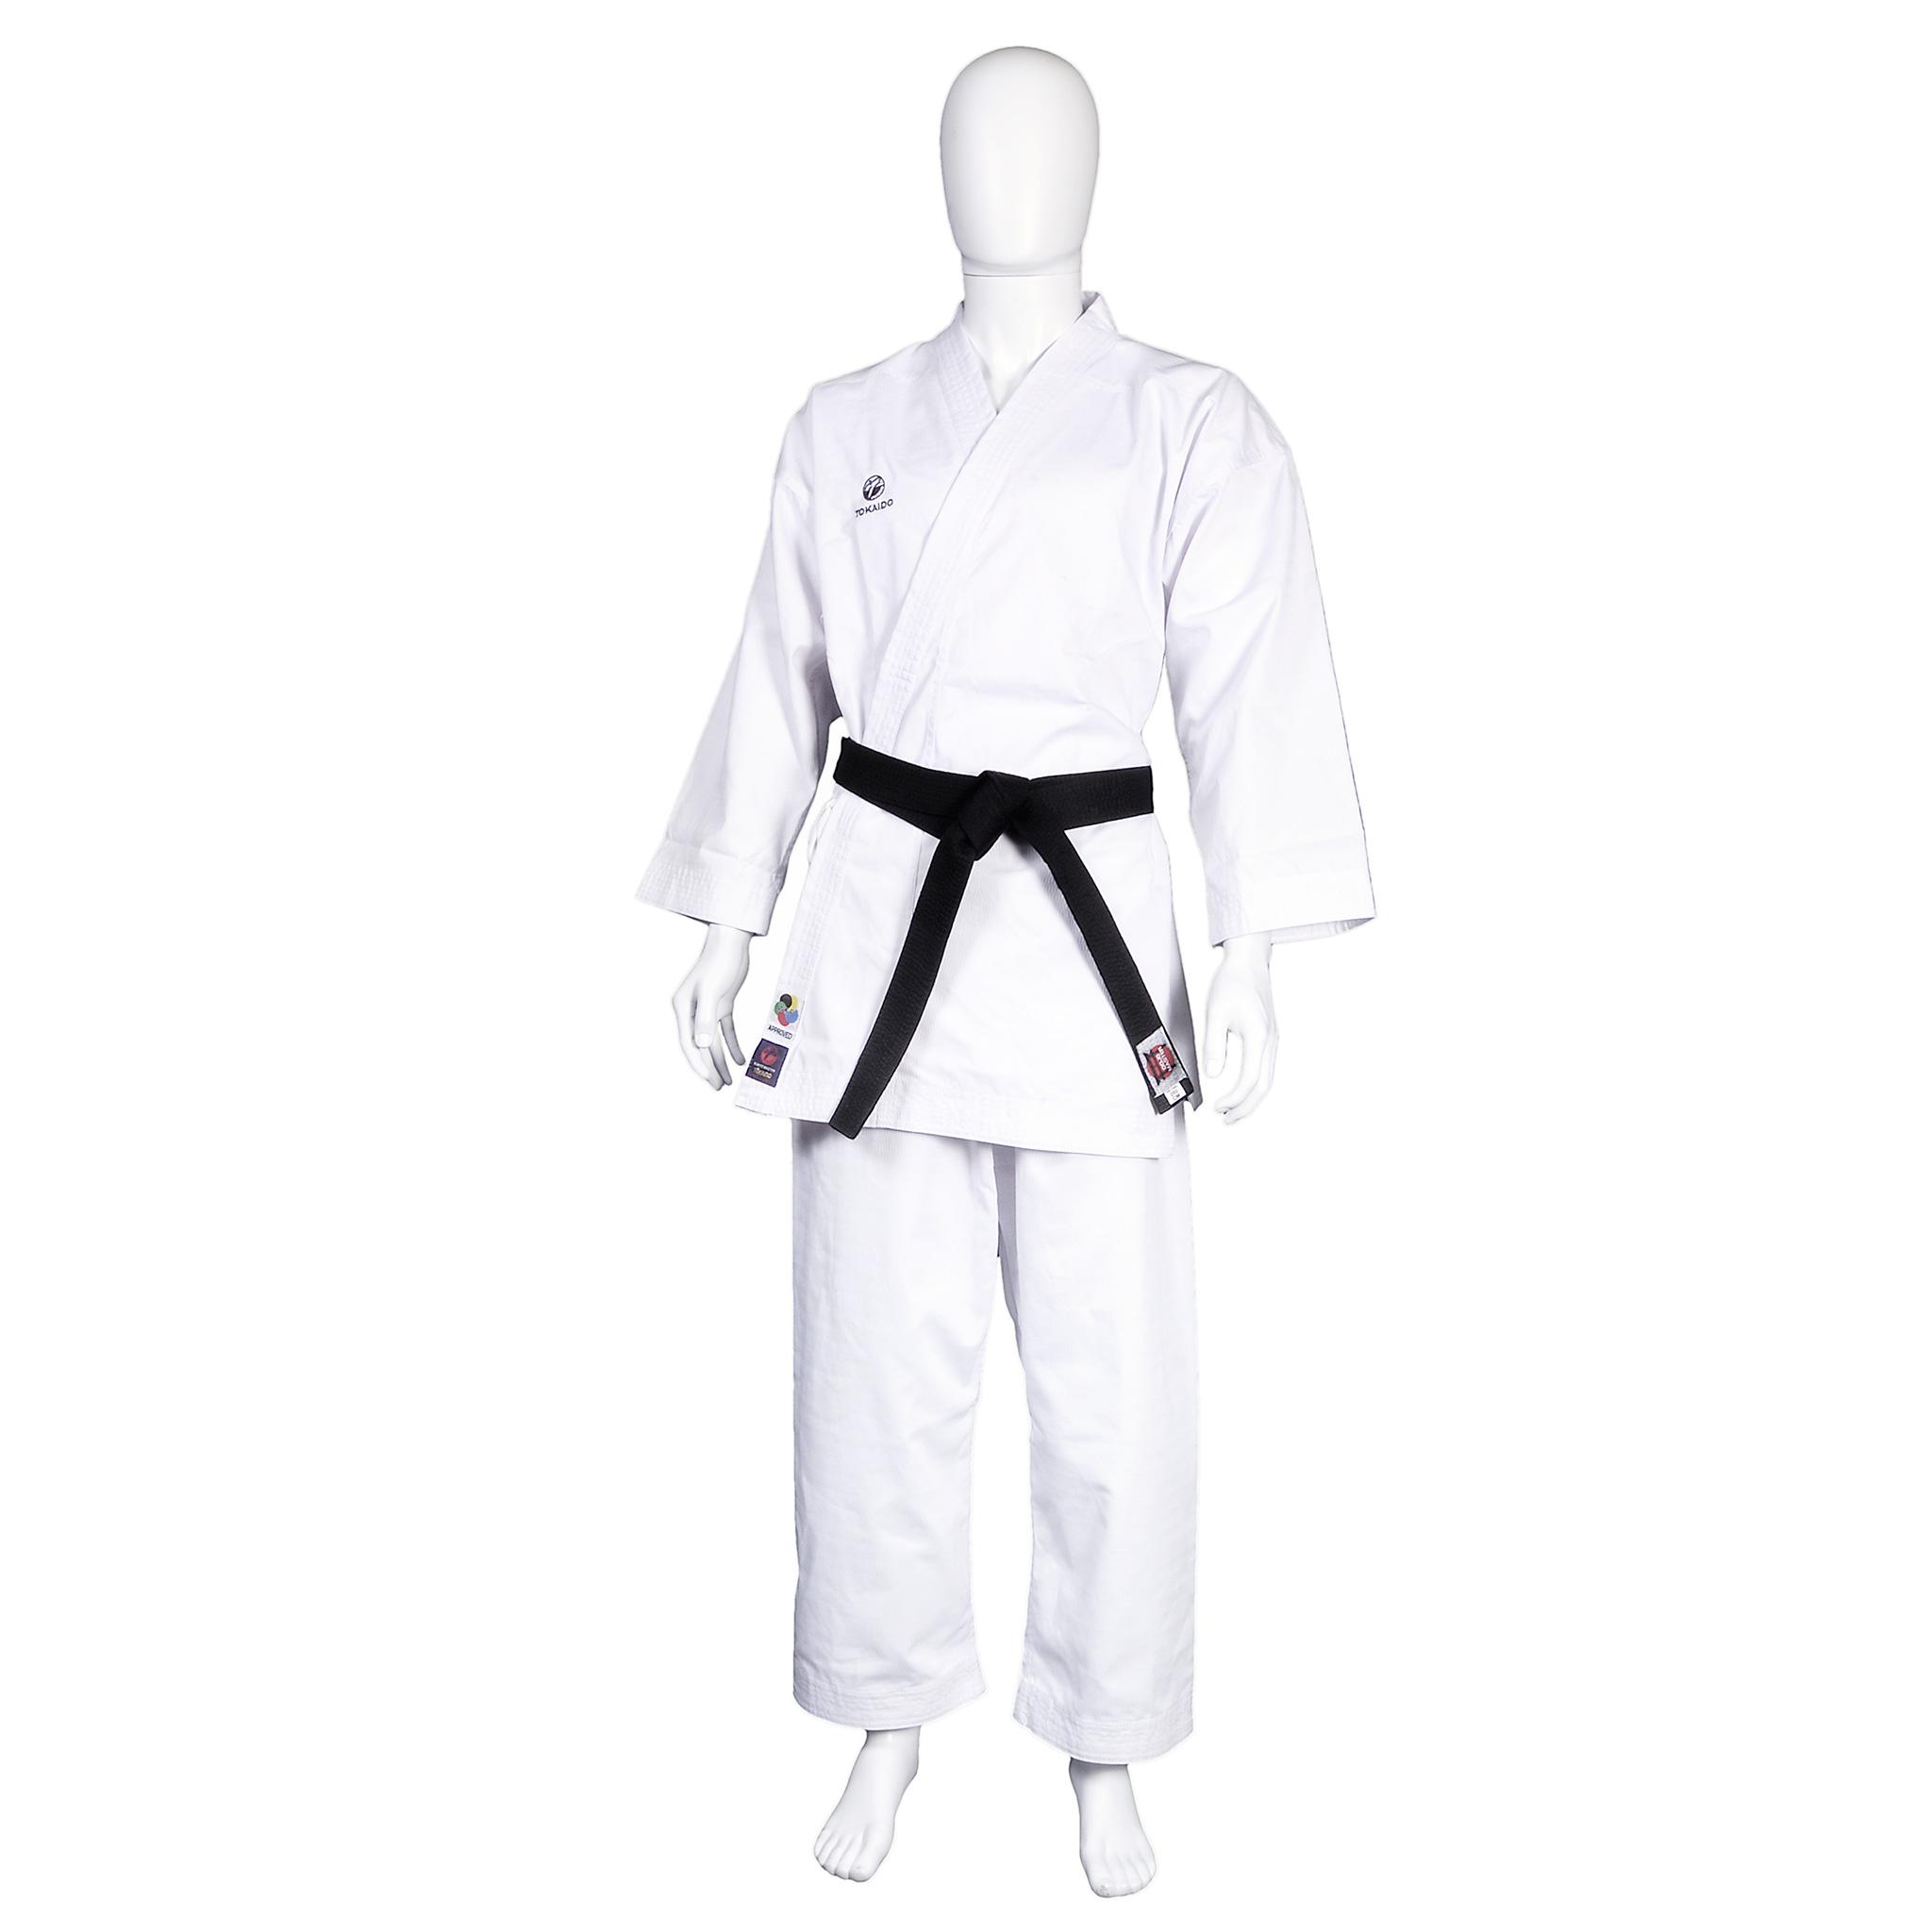 Or Adidas Sac Spirit Judo Budo 6xH1wId4